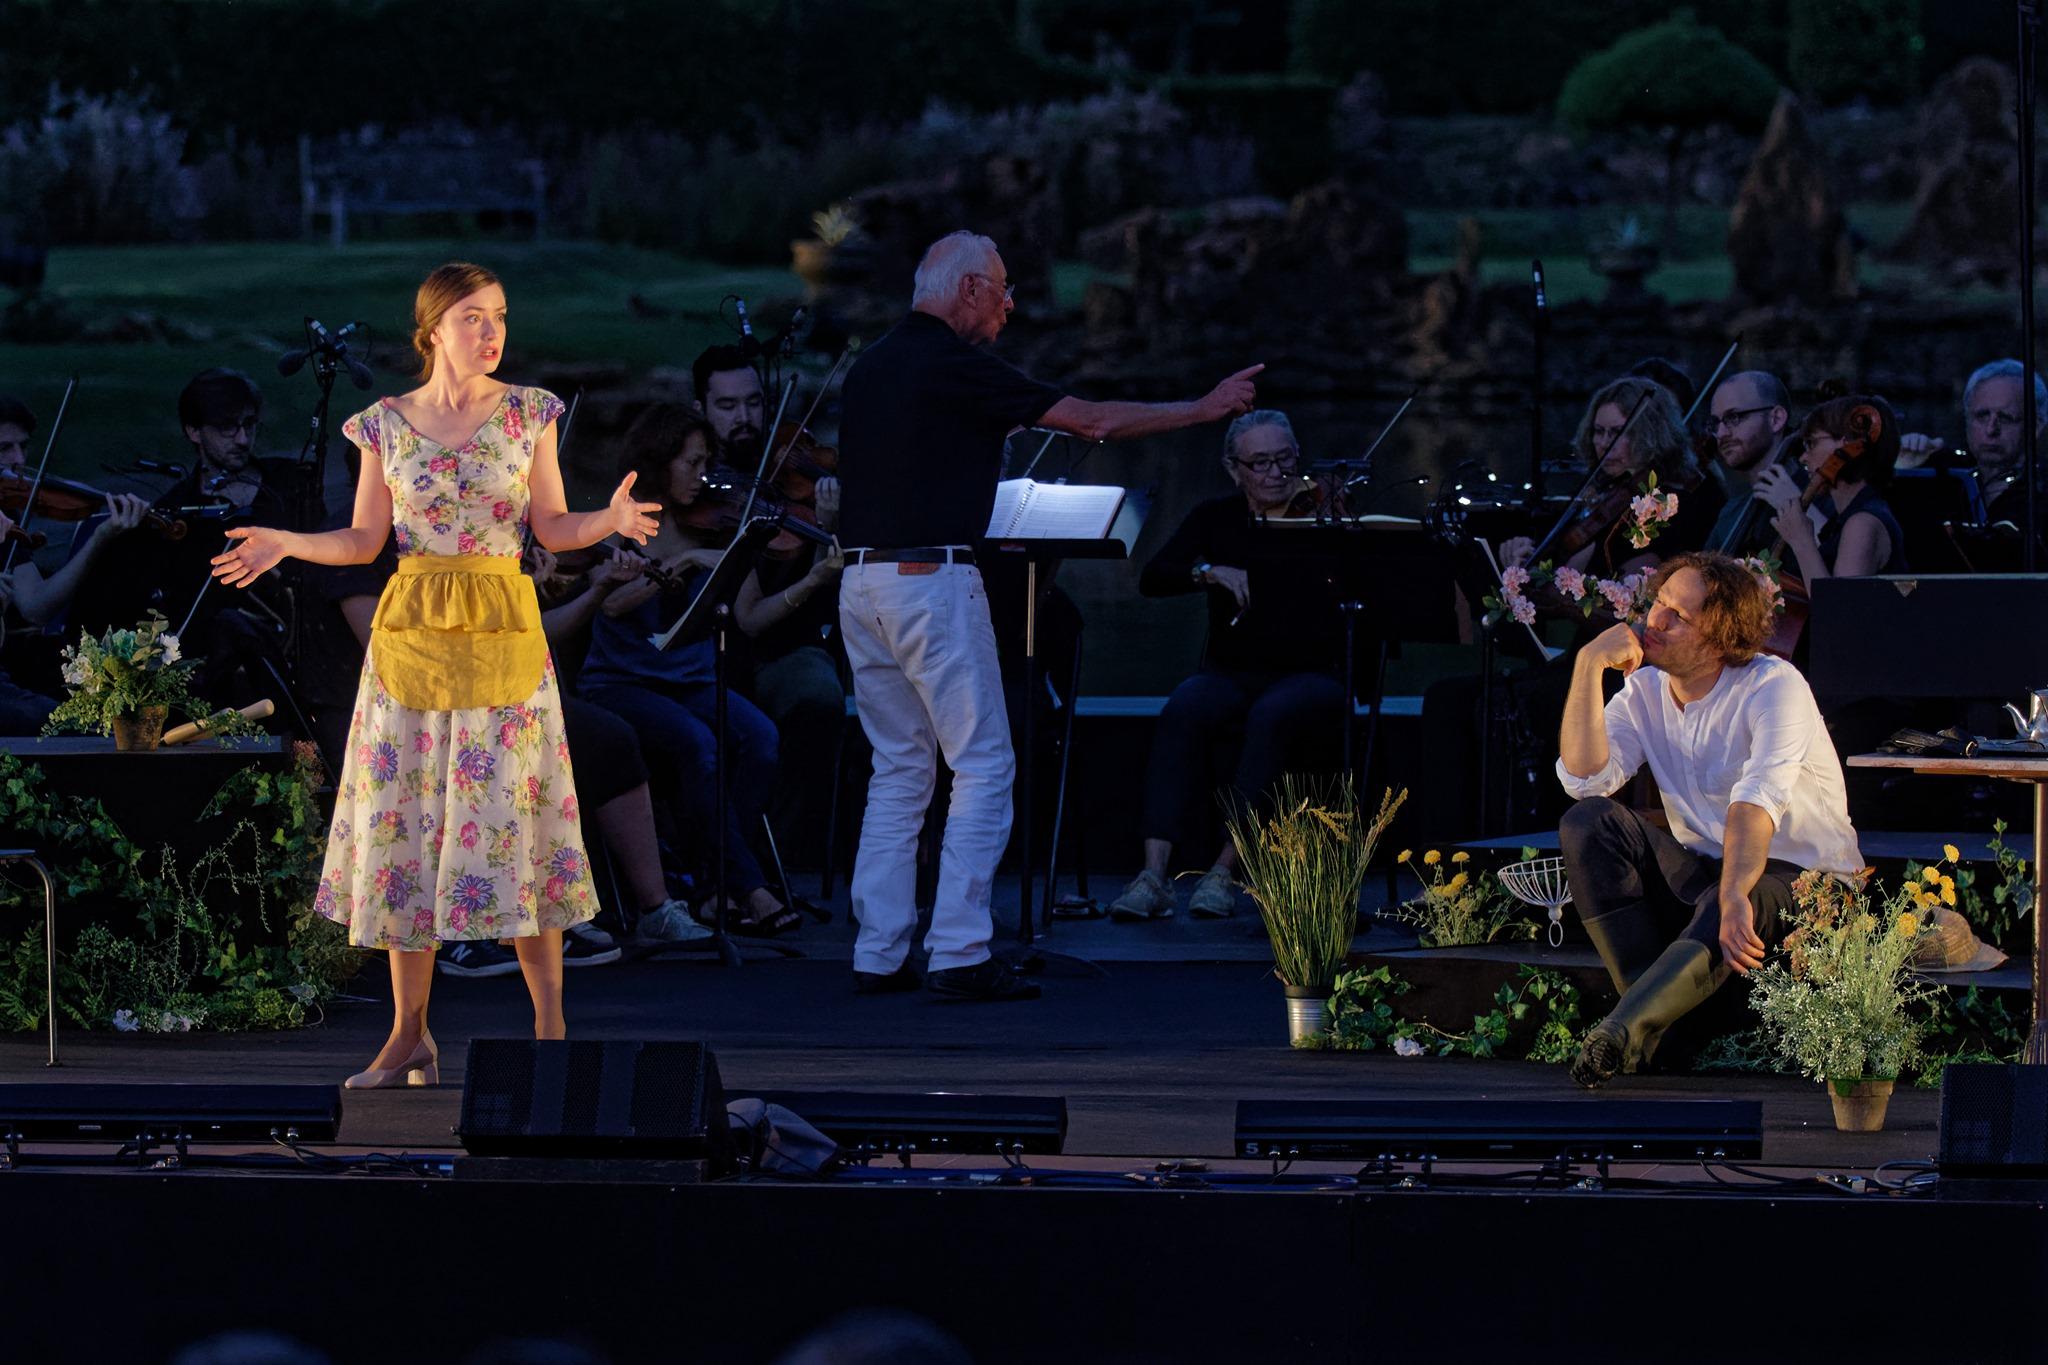 Serpetta  La finta giardiniera  Mozart  Les Arts Florissants cond. William Christie  © Jacky Joccotton 2019